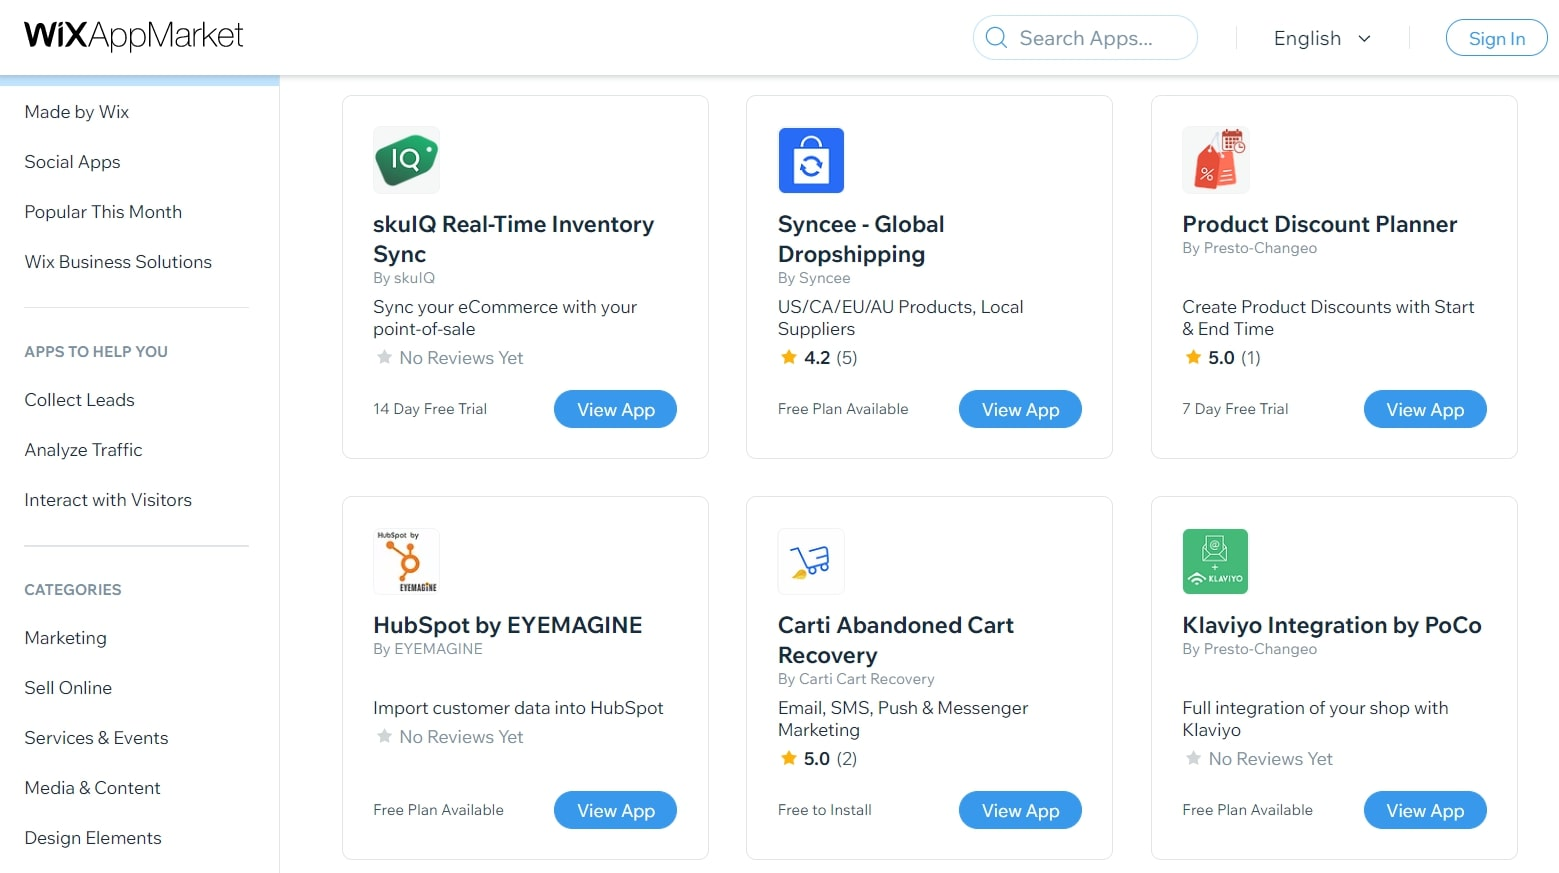 Wix's Wix App Market homepage